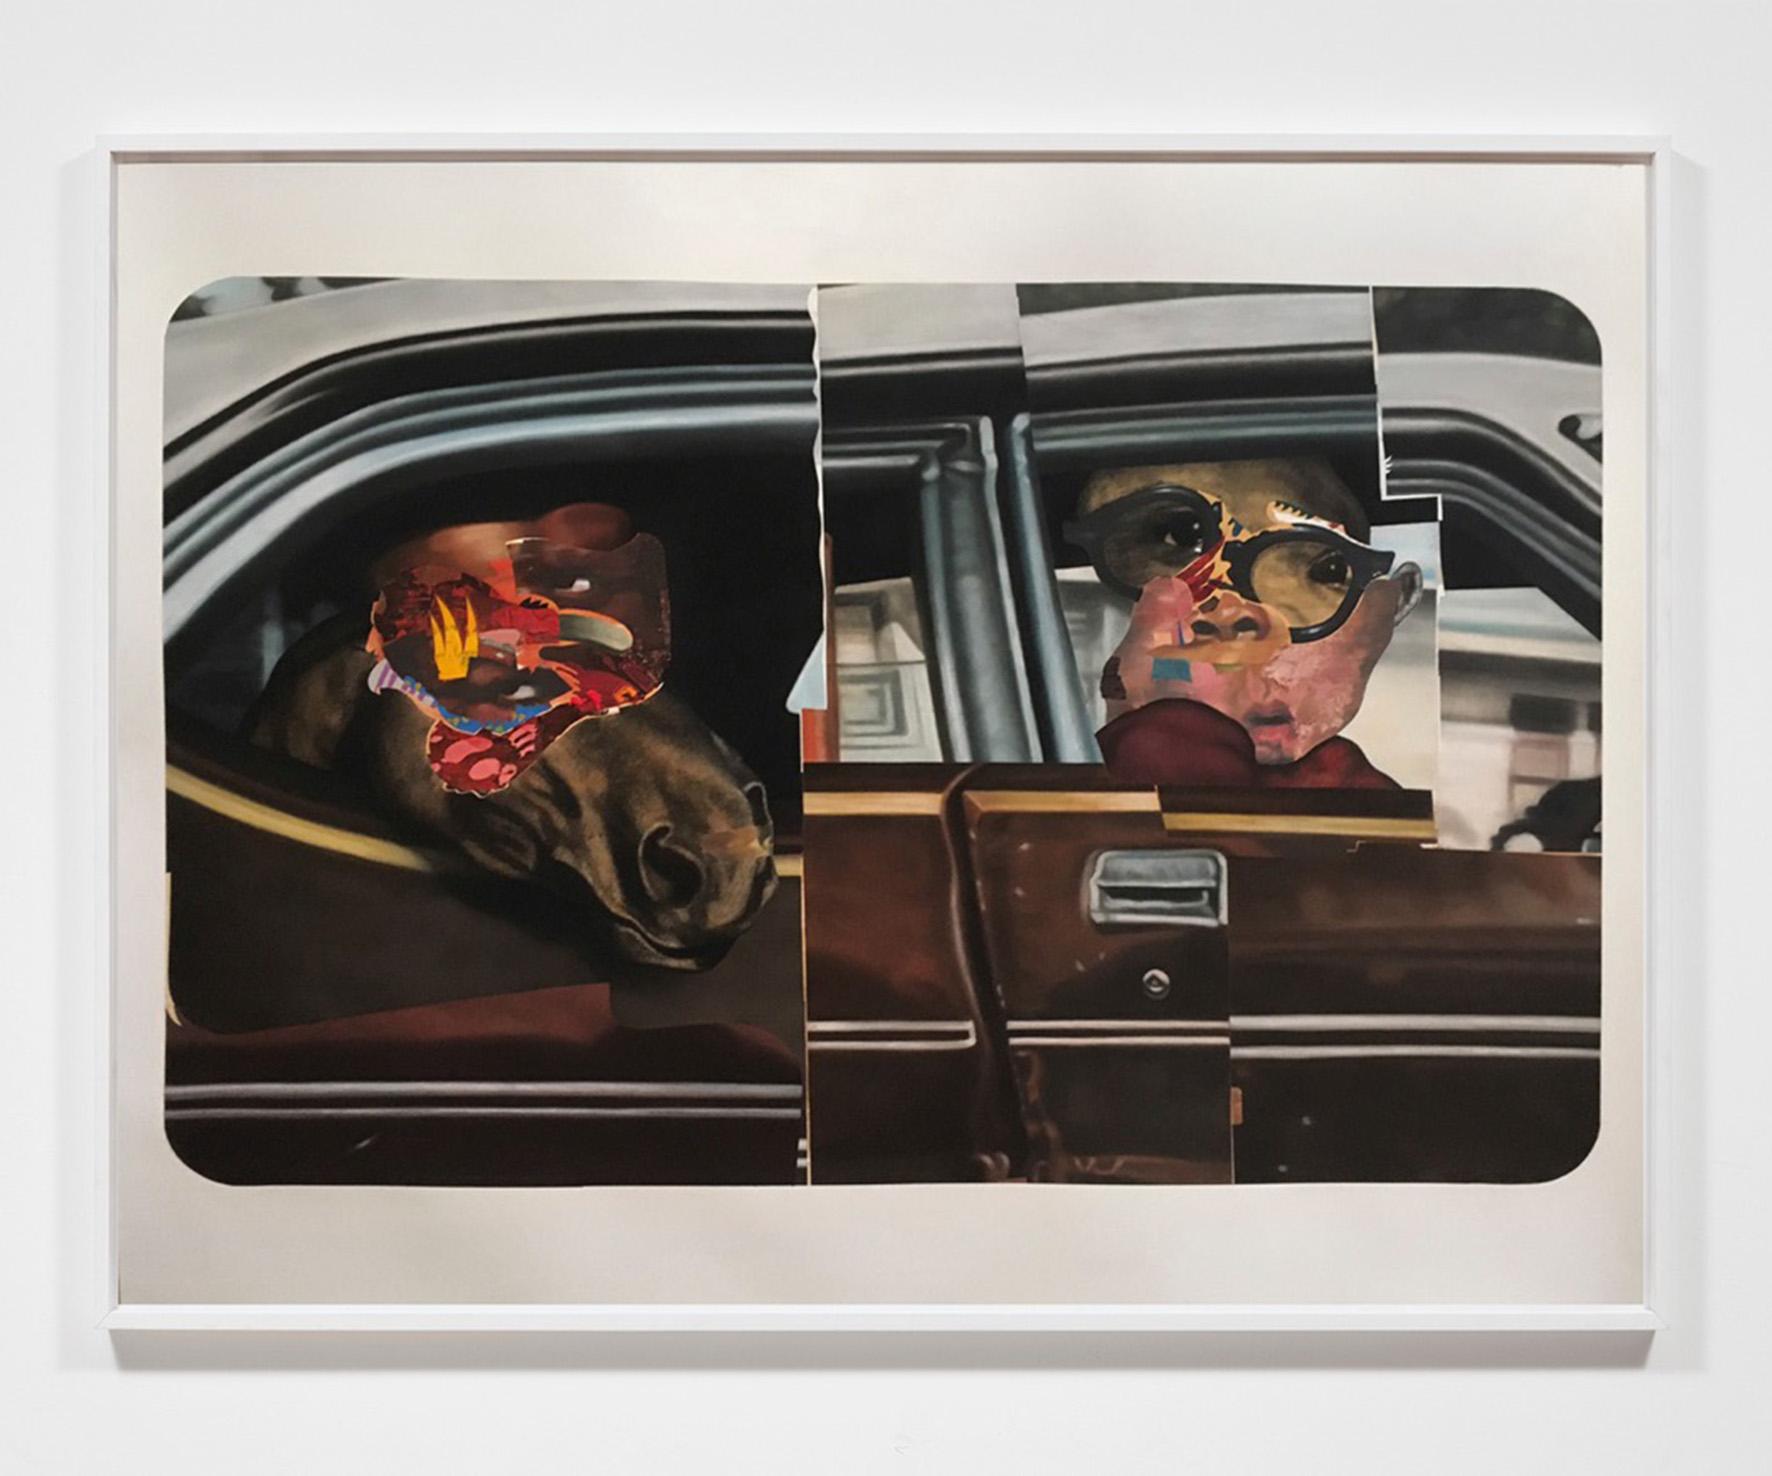 N.M. Quinn, 'St. Marks, Terry', 2016, dipinto a tecnica mista, in esposizione alla Luce Gallery di Torino © aut./LuceGallery